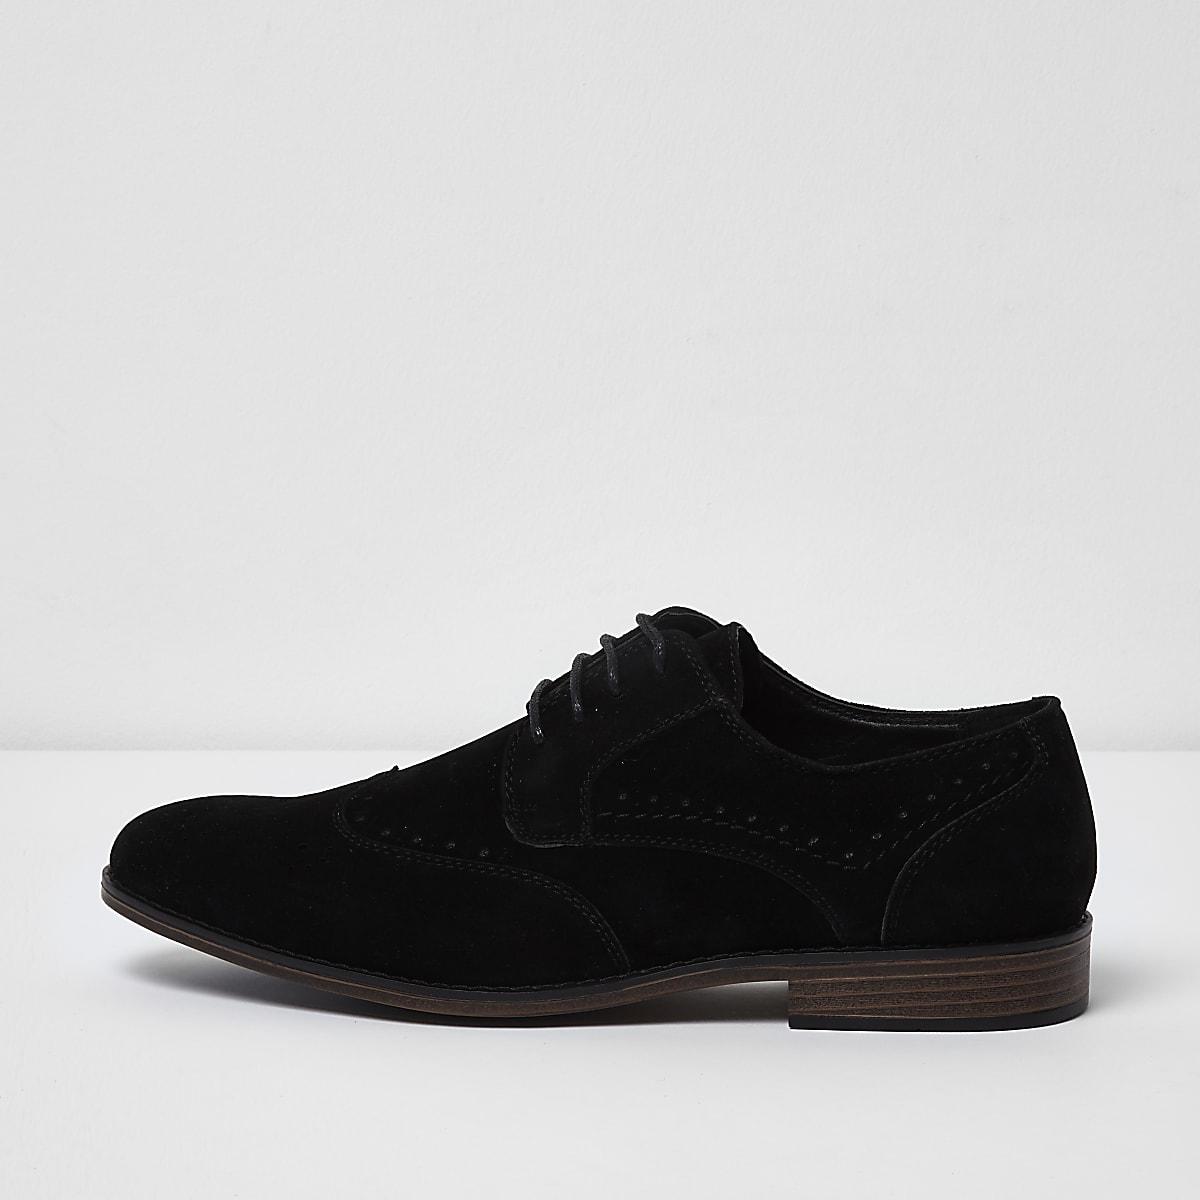 Black wide fit faux suede lace-up brogues